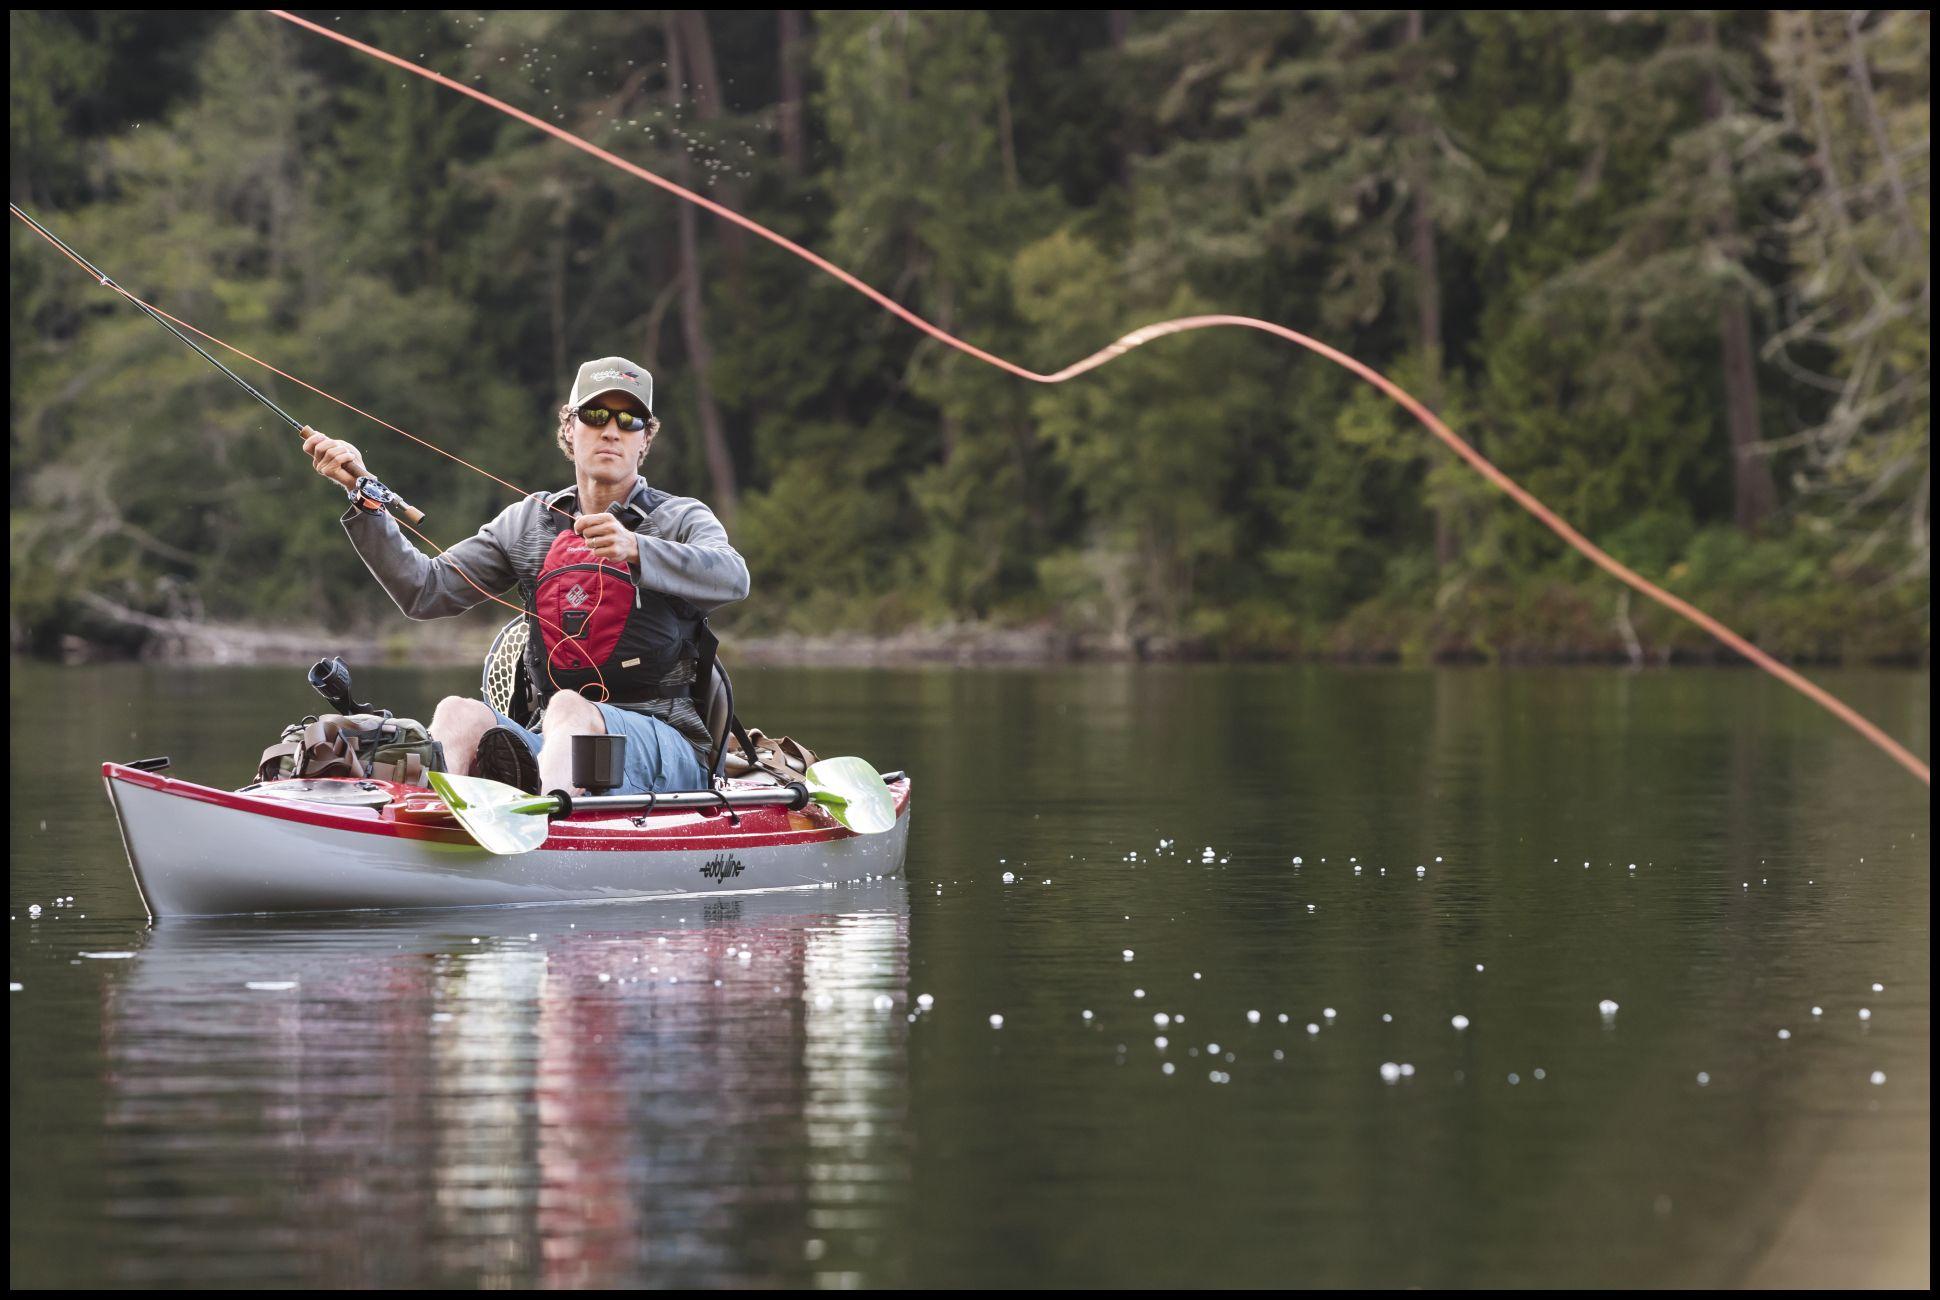 Kayaks: Caribbean 14 Angler by Eddyline Kayaks - Image 2601